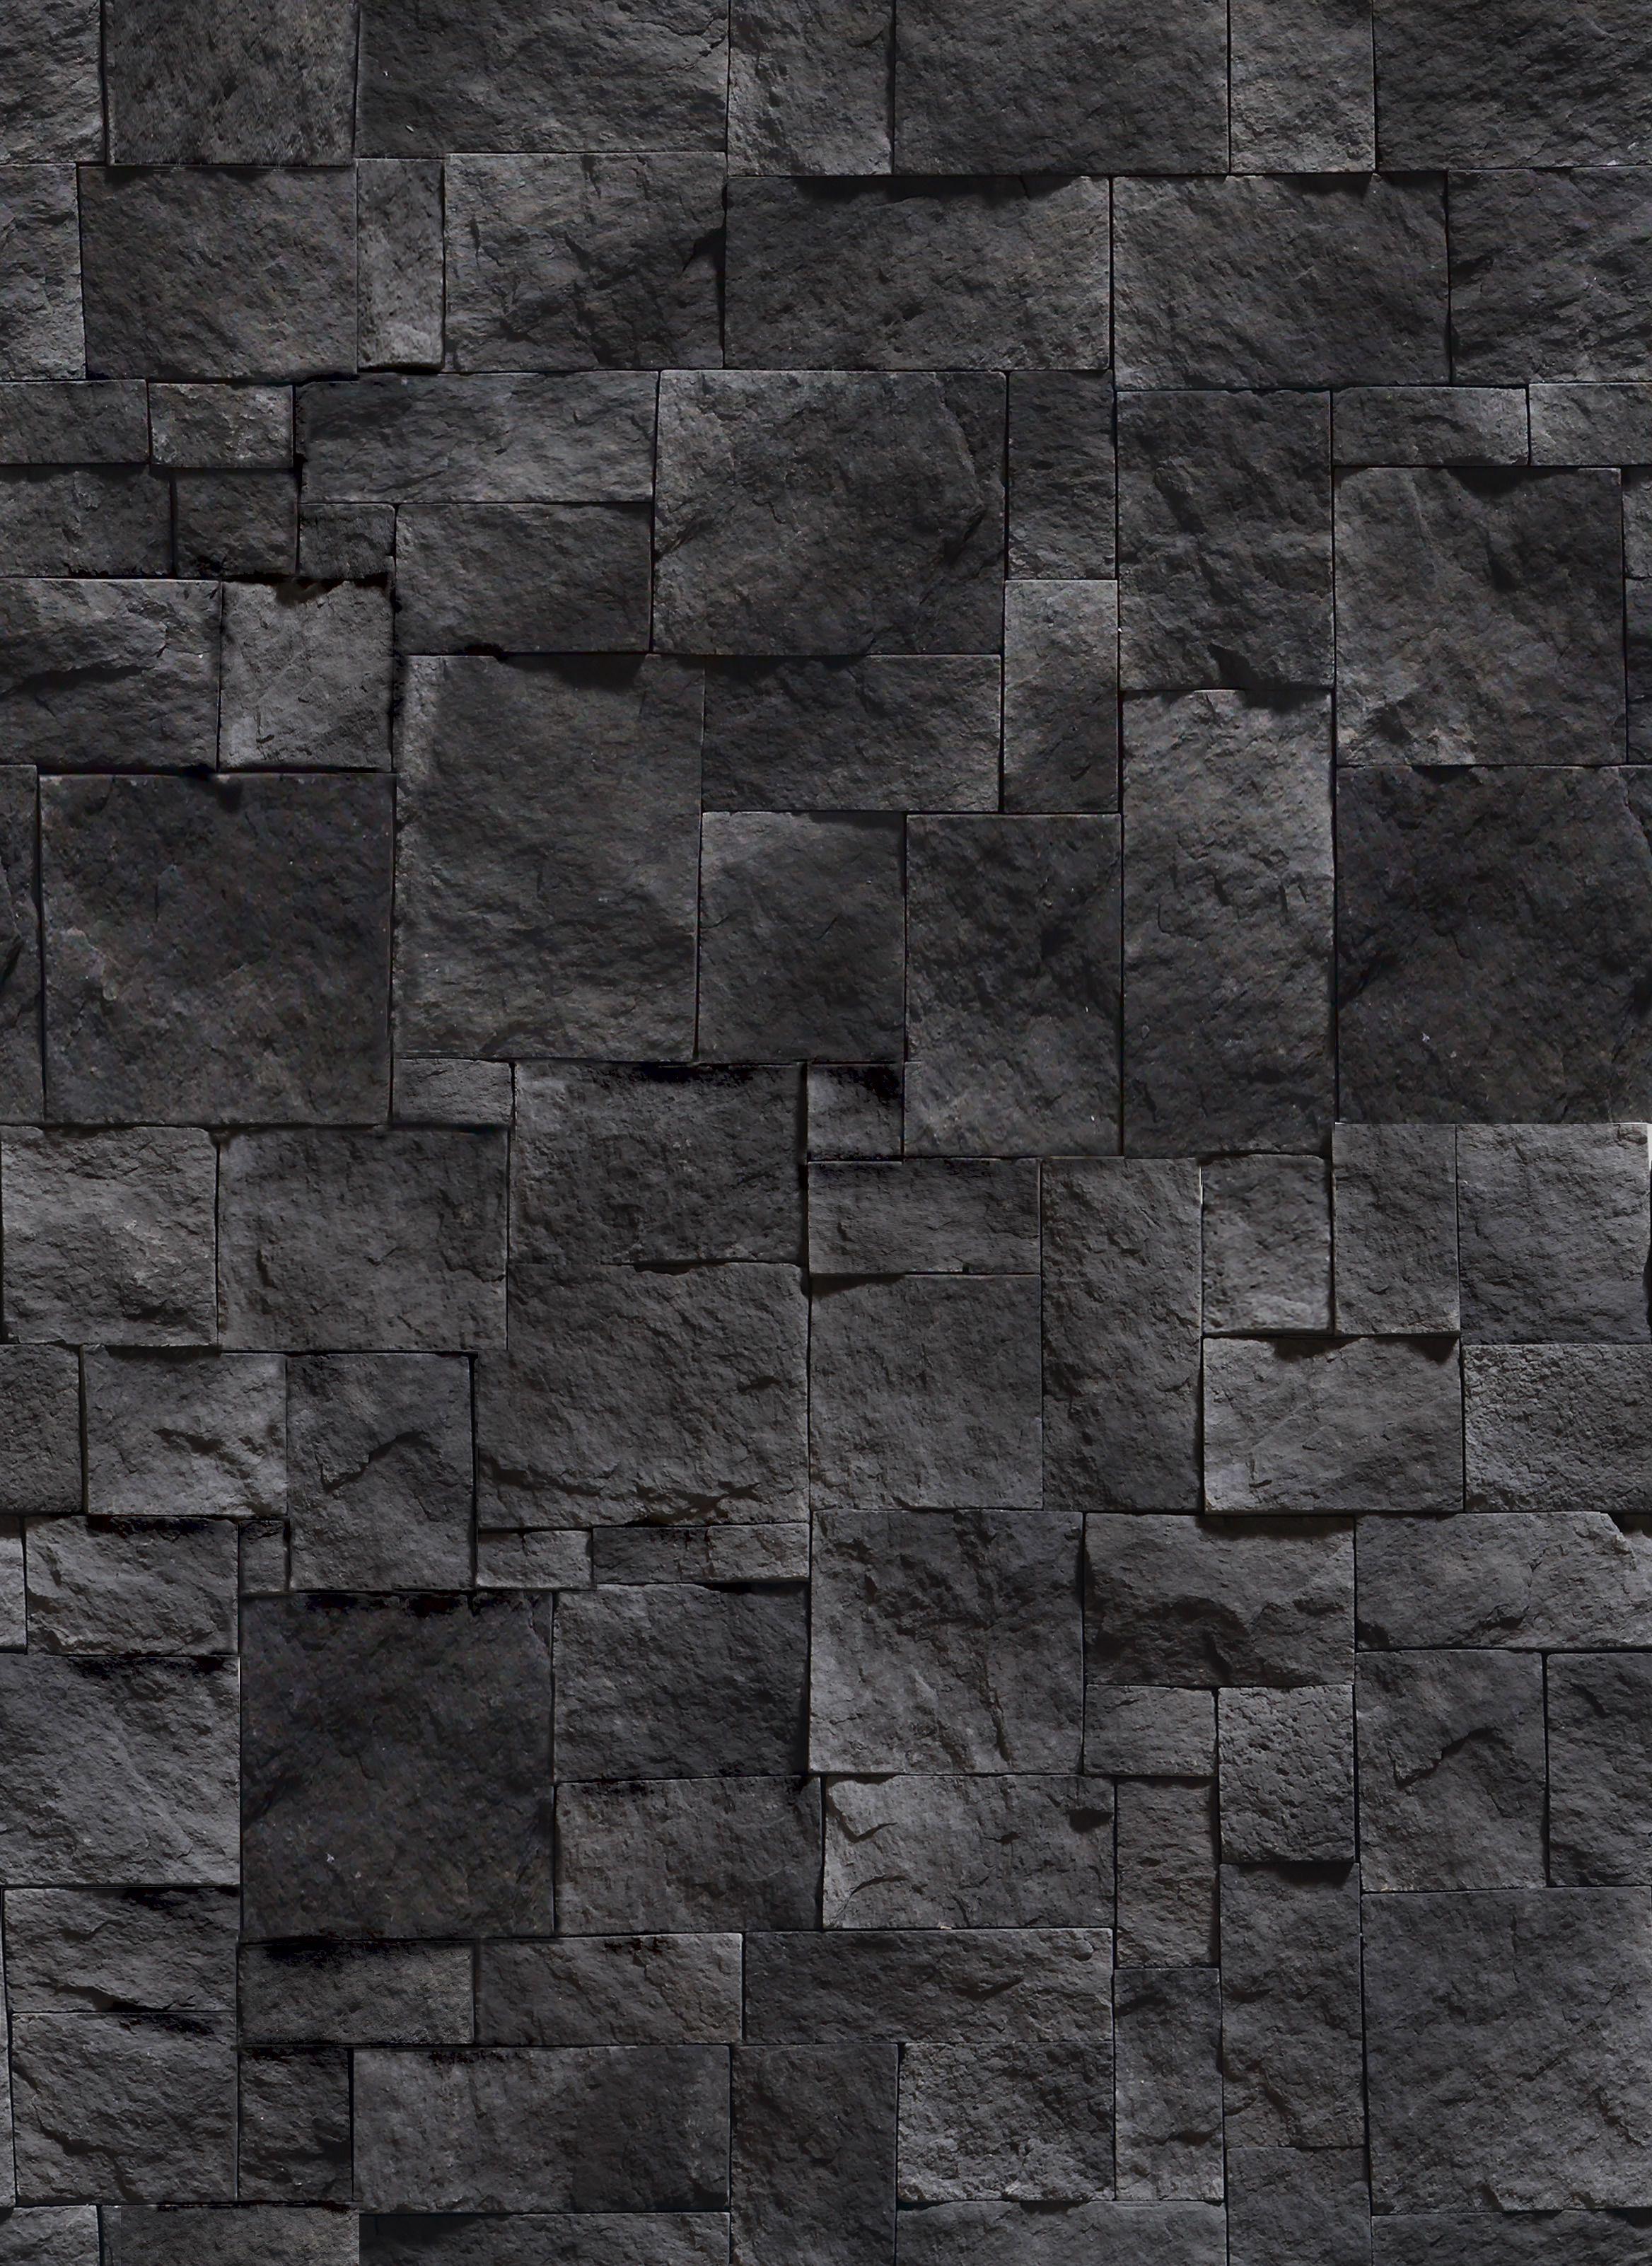 Black Stone Wall Texture Design Inspiration 29211 Floor Ideas